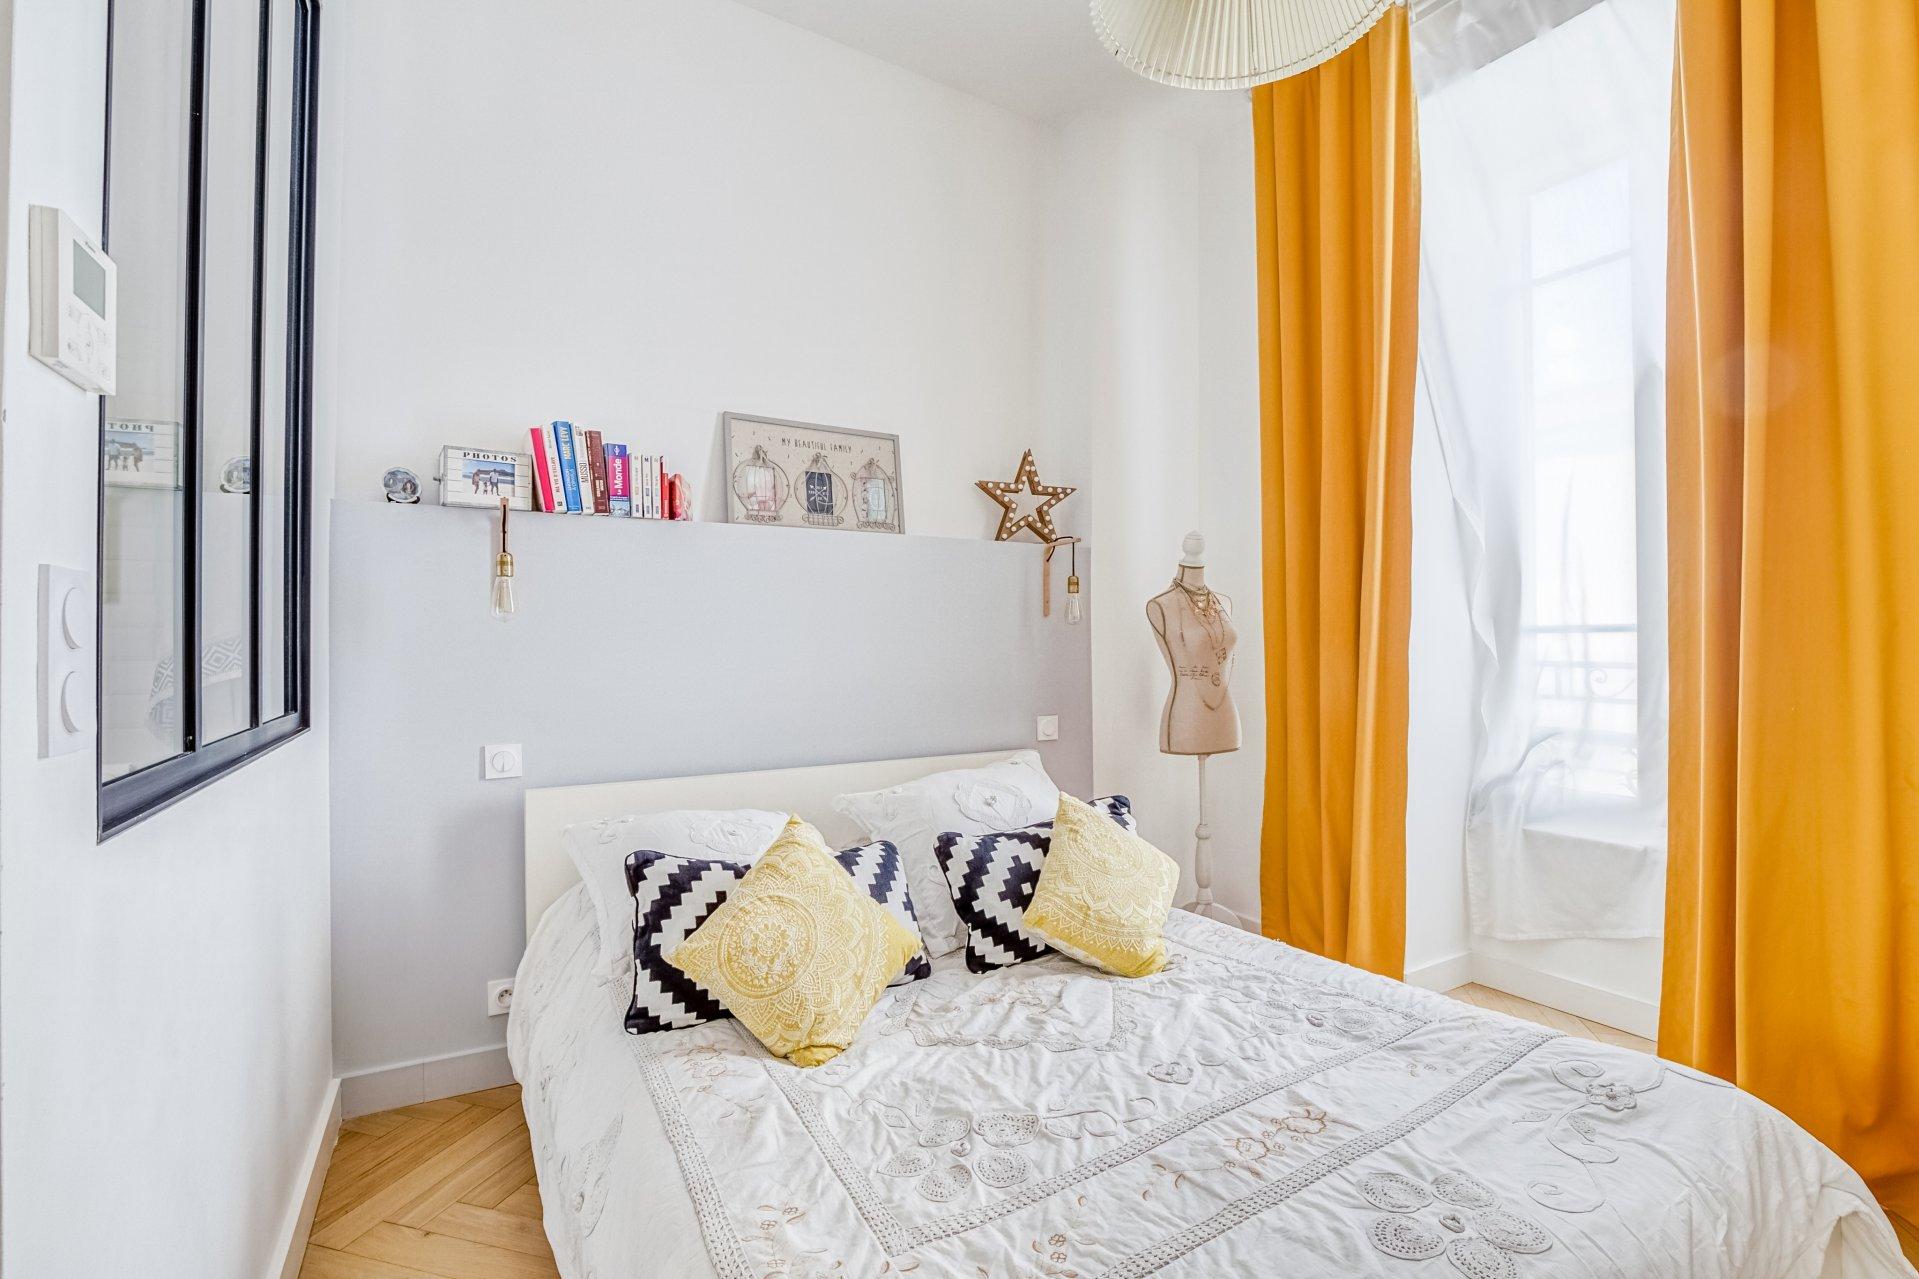 Nice Wilson - Beautifull 3 bedrooms apartement with balcony.